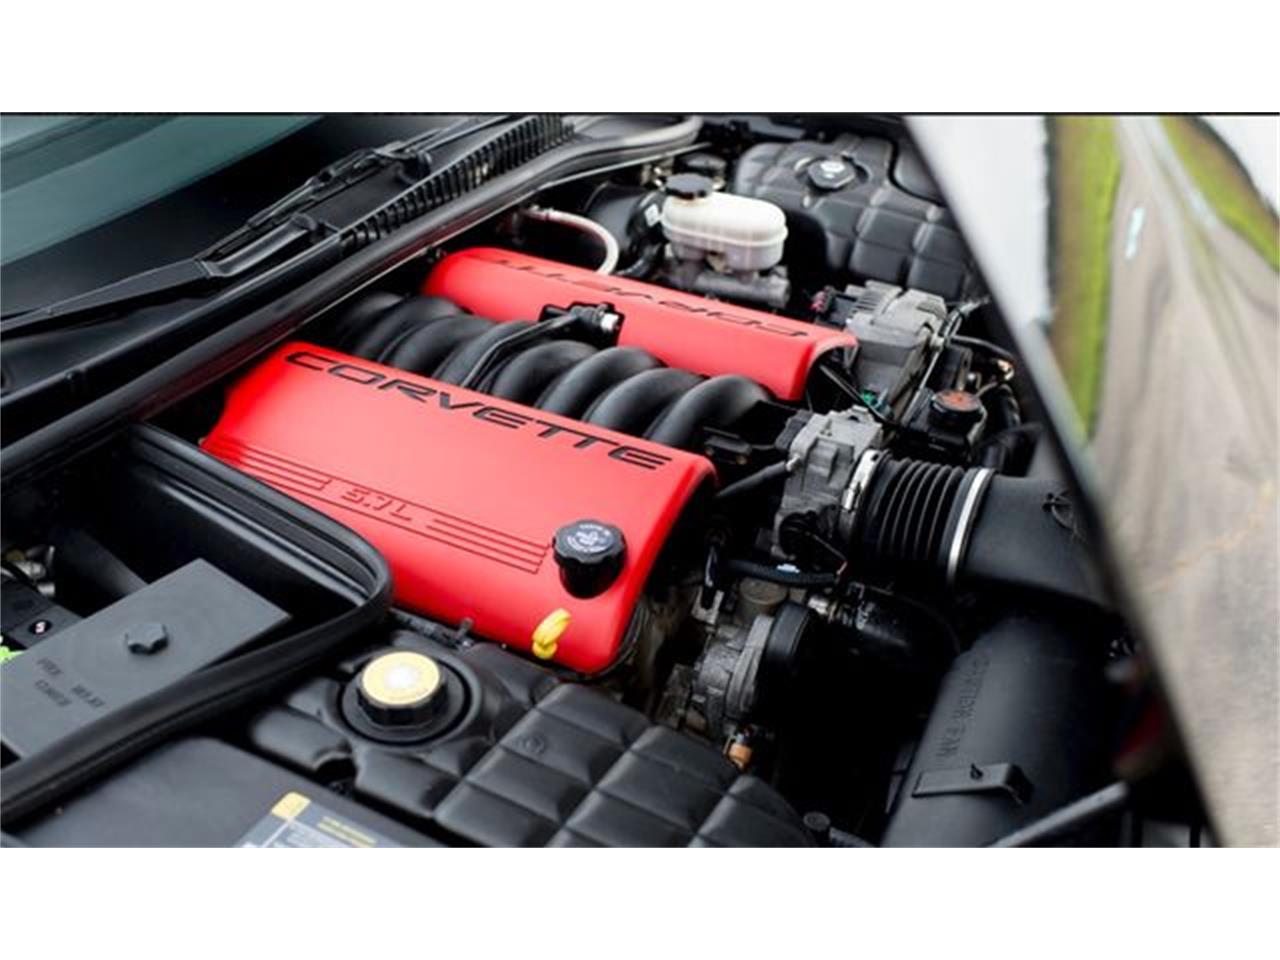 2002 Chevrolet Corvette (CC-1258376) for sale in Valley Park, Missouri